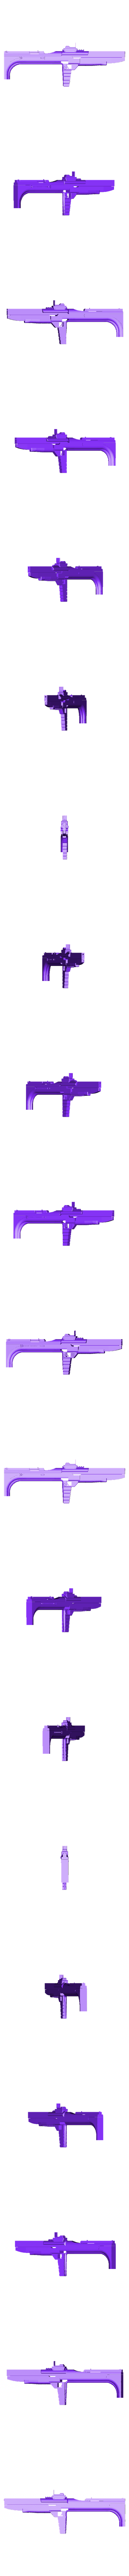 rifle_whole.stl Download free STL file Photon Rifle (The Flash) • 3D print template, poblocki1982